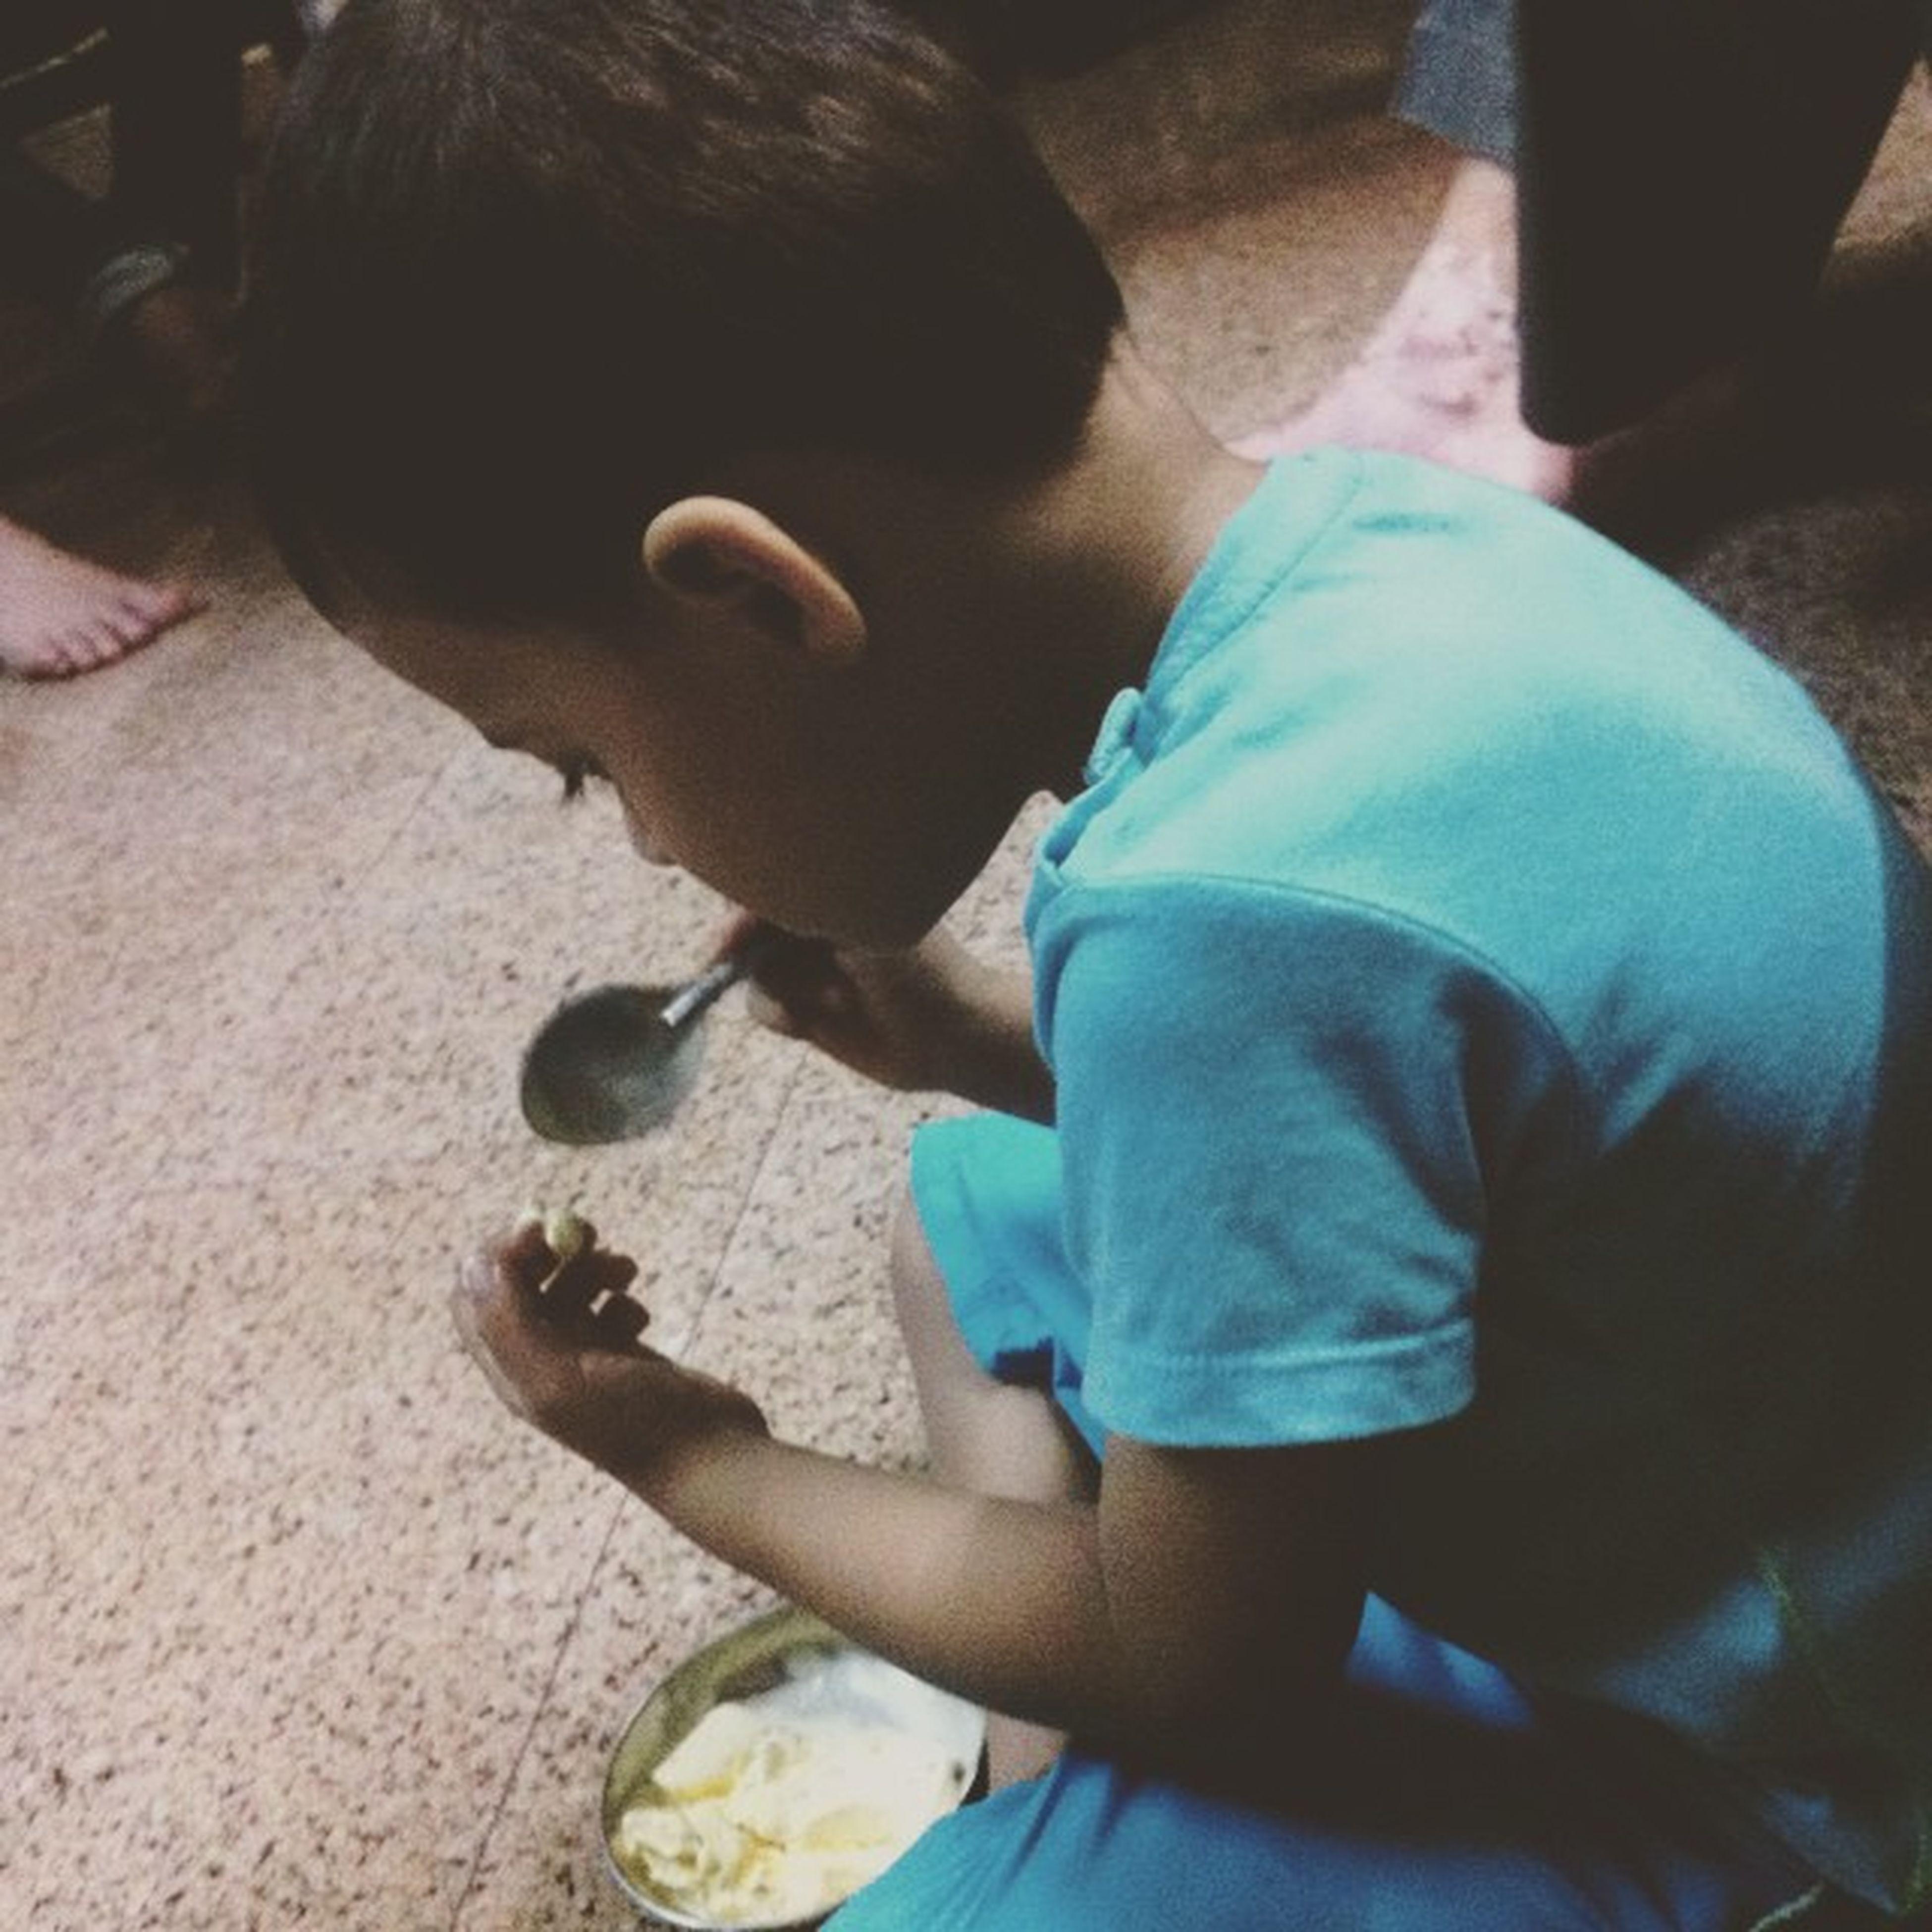 Kids and their eternal joy for ice-creams. Kids Love Madewithlove Childreninmyframe Bhanjathecutest Icecreamlove Foodlove Foodtalkindia Cutenessoverload Bundleofjoy Childlikecuriosities Blueinmyframe Delightfullblues Blissfullblues 😚 Instagrameditsonly Iphoneonly Instagram Igers Igersjoy Delightfullblueseries Jj  Jj_indetail Jj_faceless